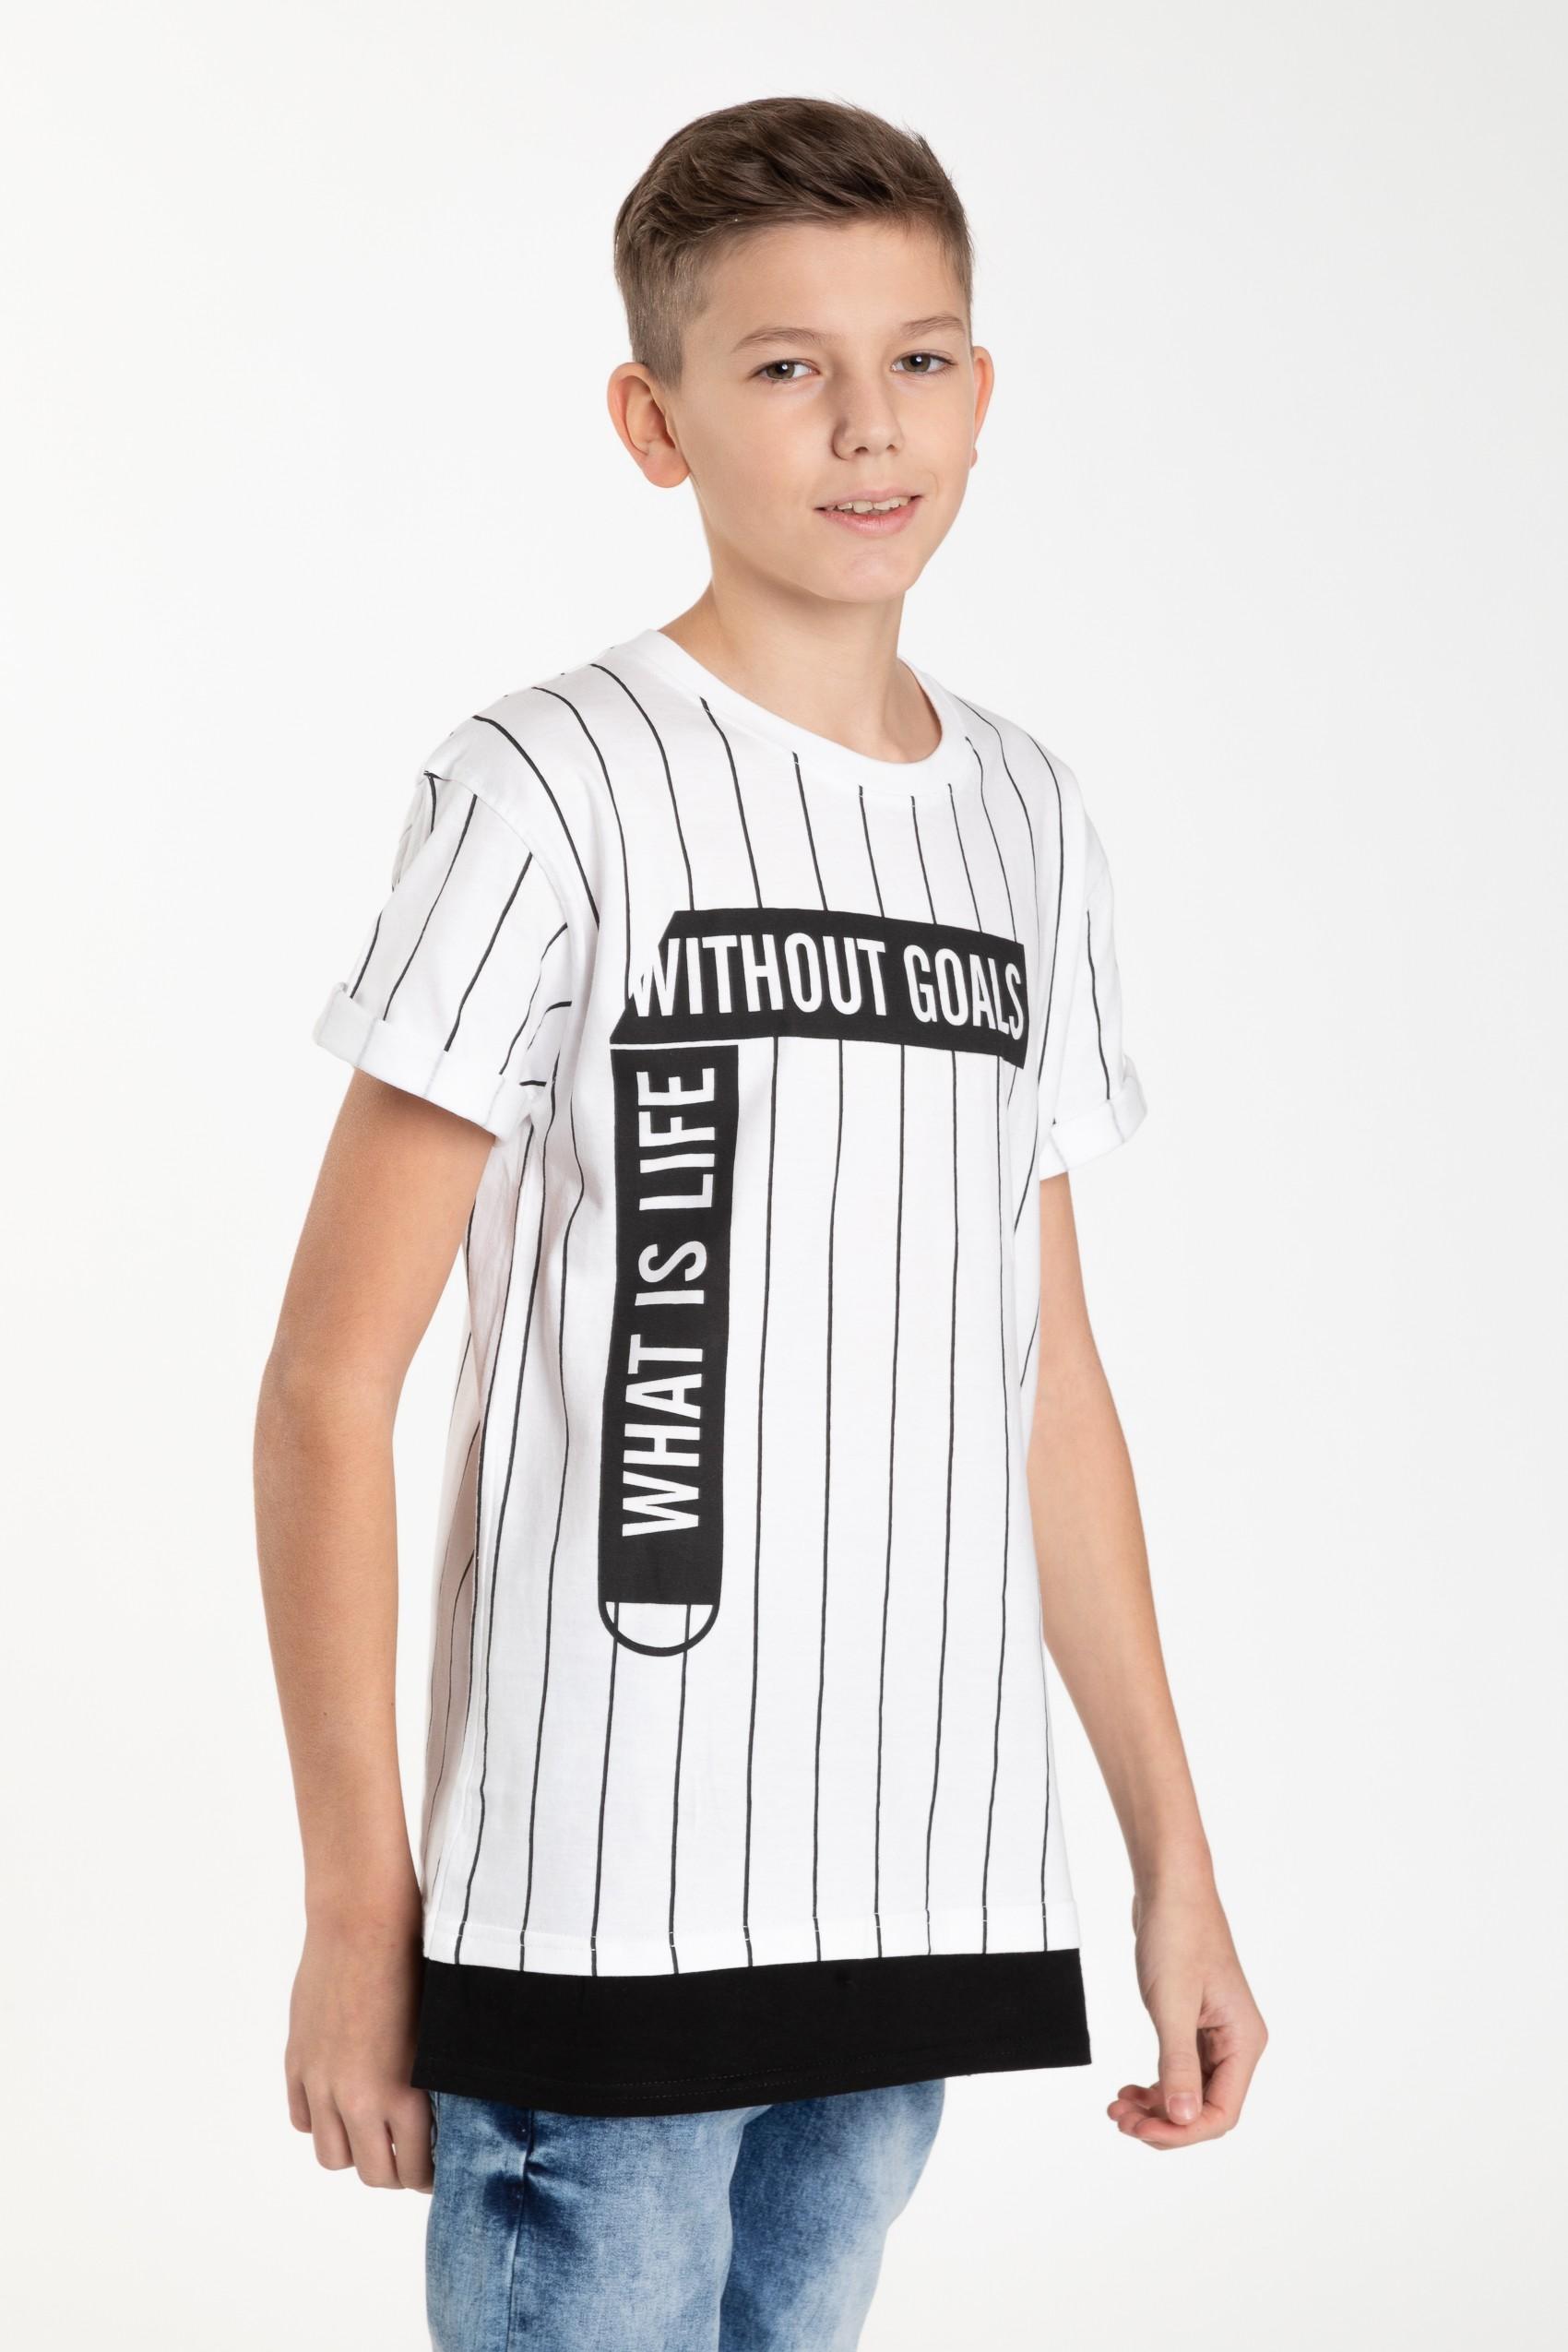 e21d6ac72f338 T-shirt w paski dla chłopaka